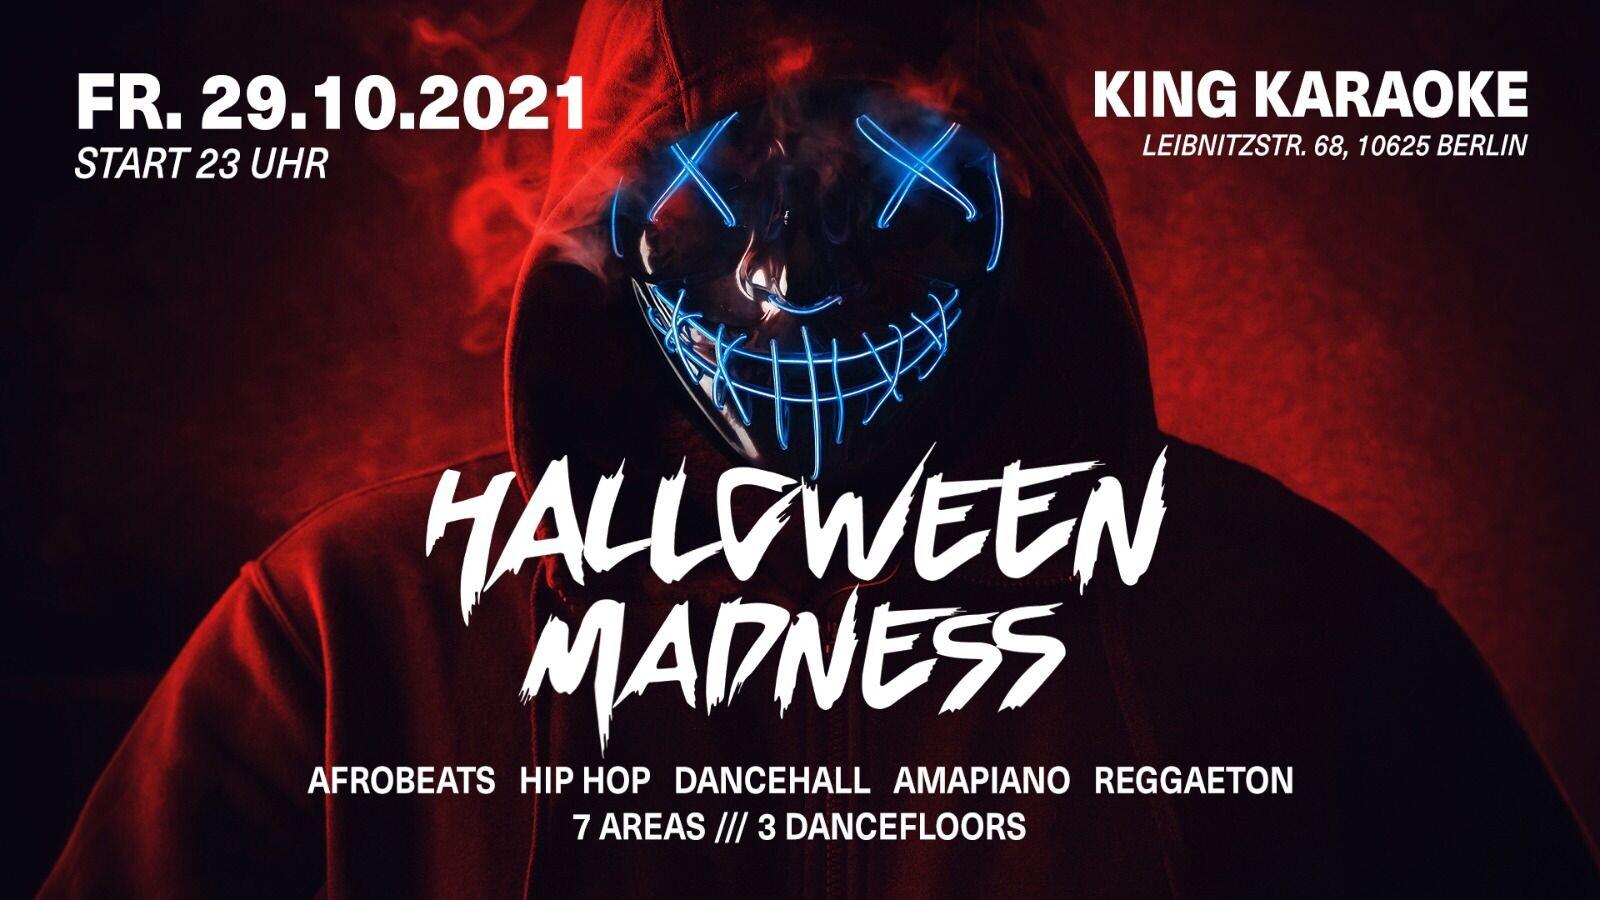 King Karaoke Bar  29.10.2021 Halloween Madness